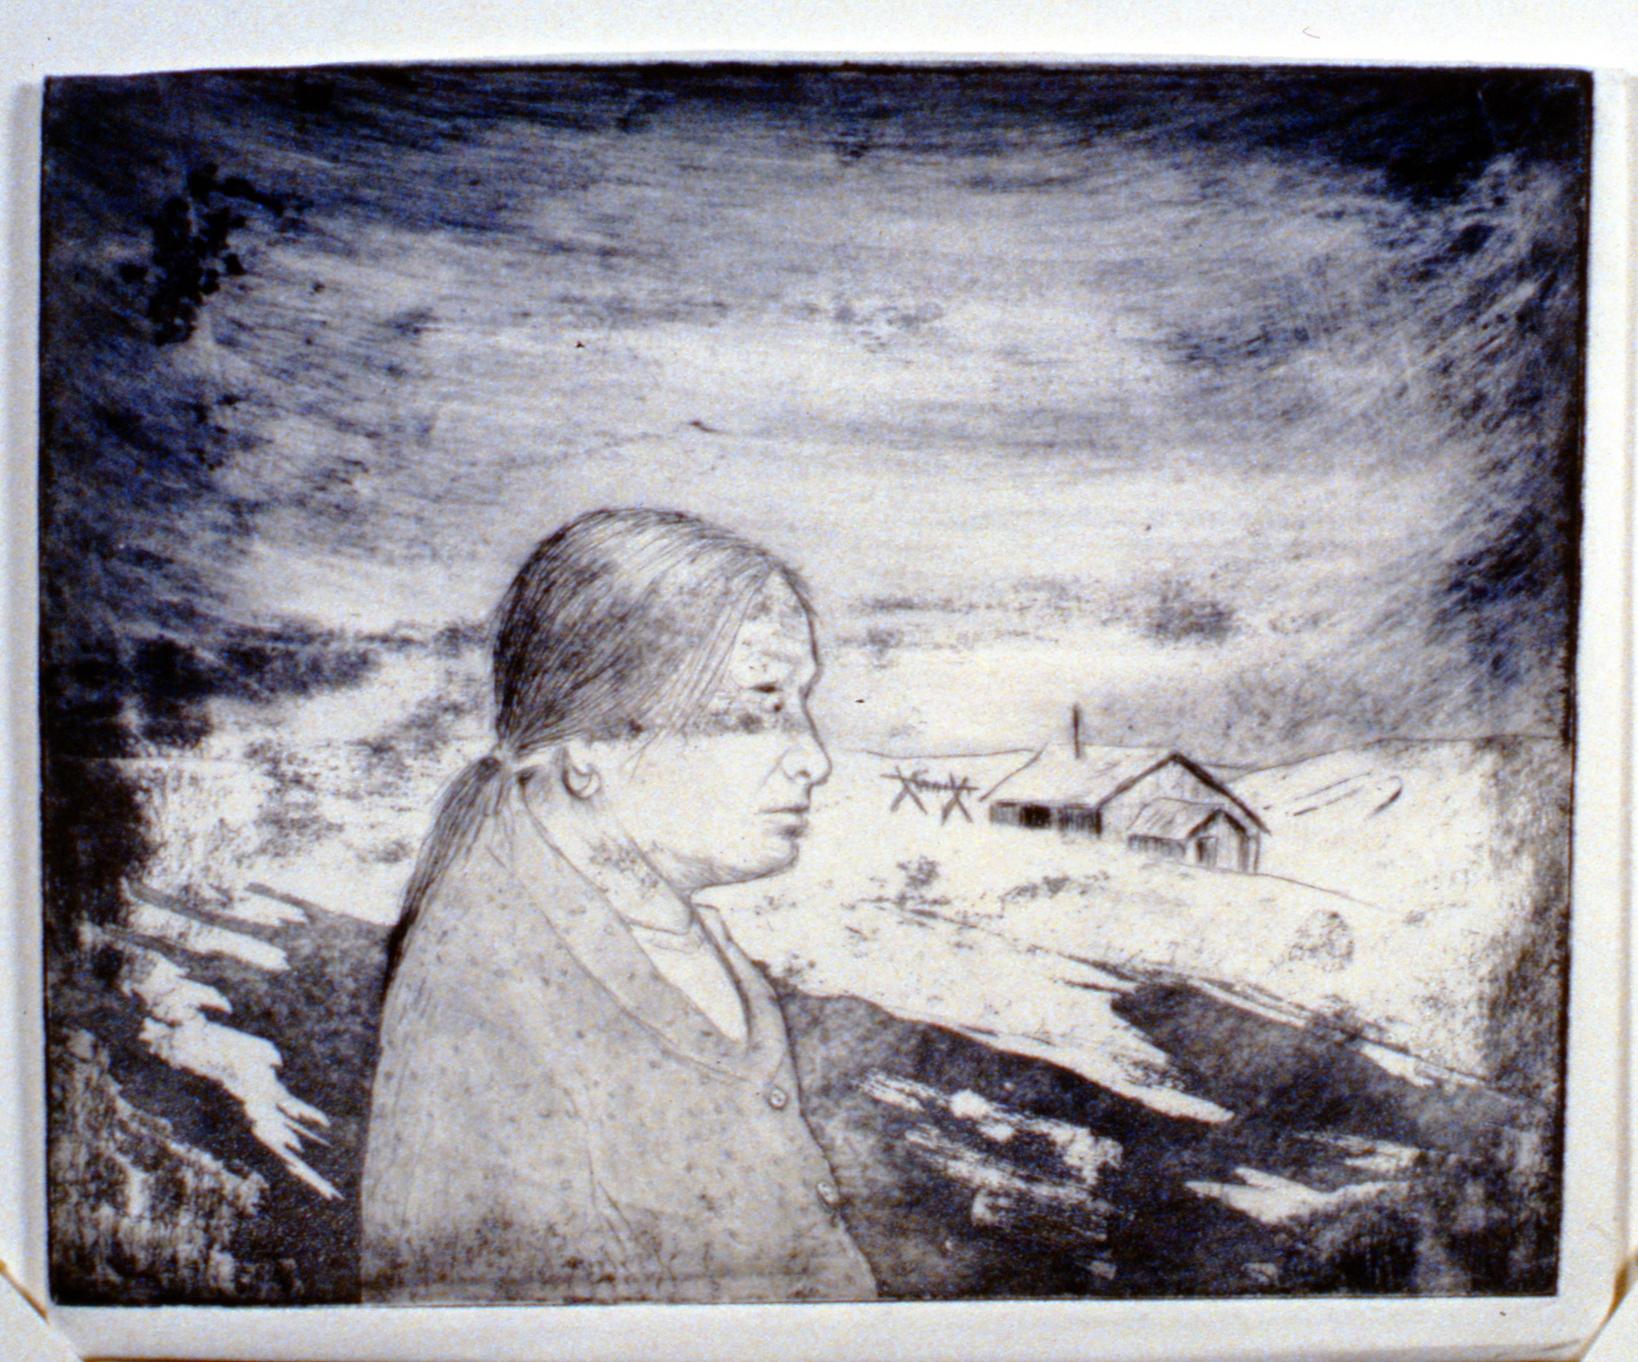 Teresa and Her Home , 1978, Minn Sjølseth, artist proof, 17.5 x 22 cm, 1996.02.17